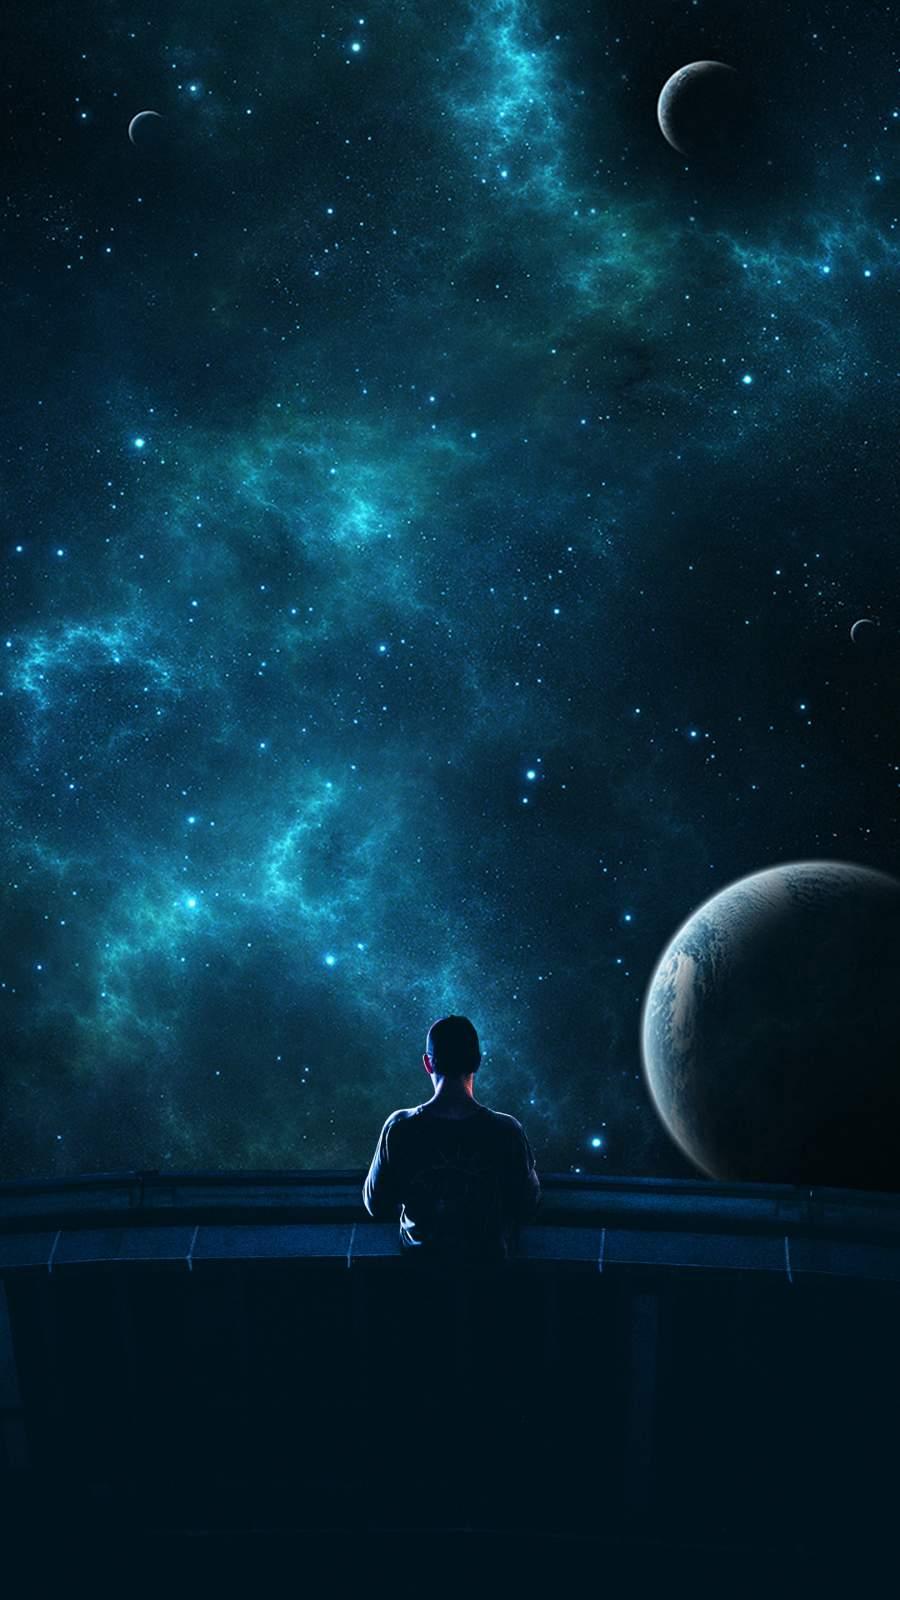 Space Man iPhone Wallpaper